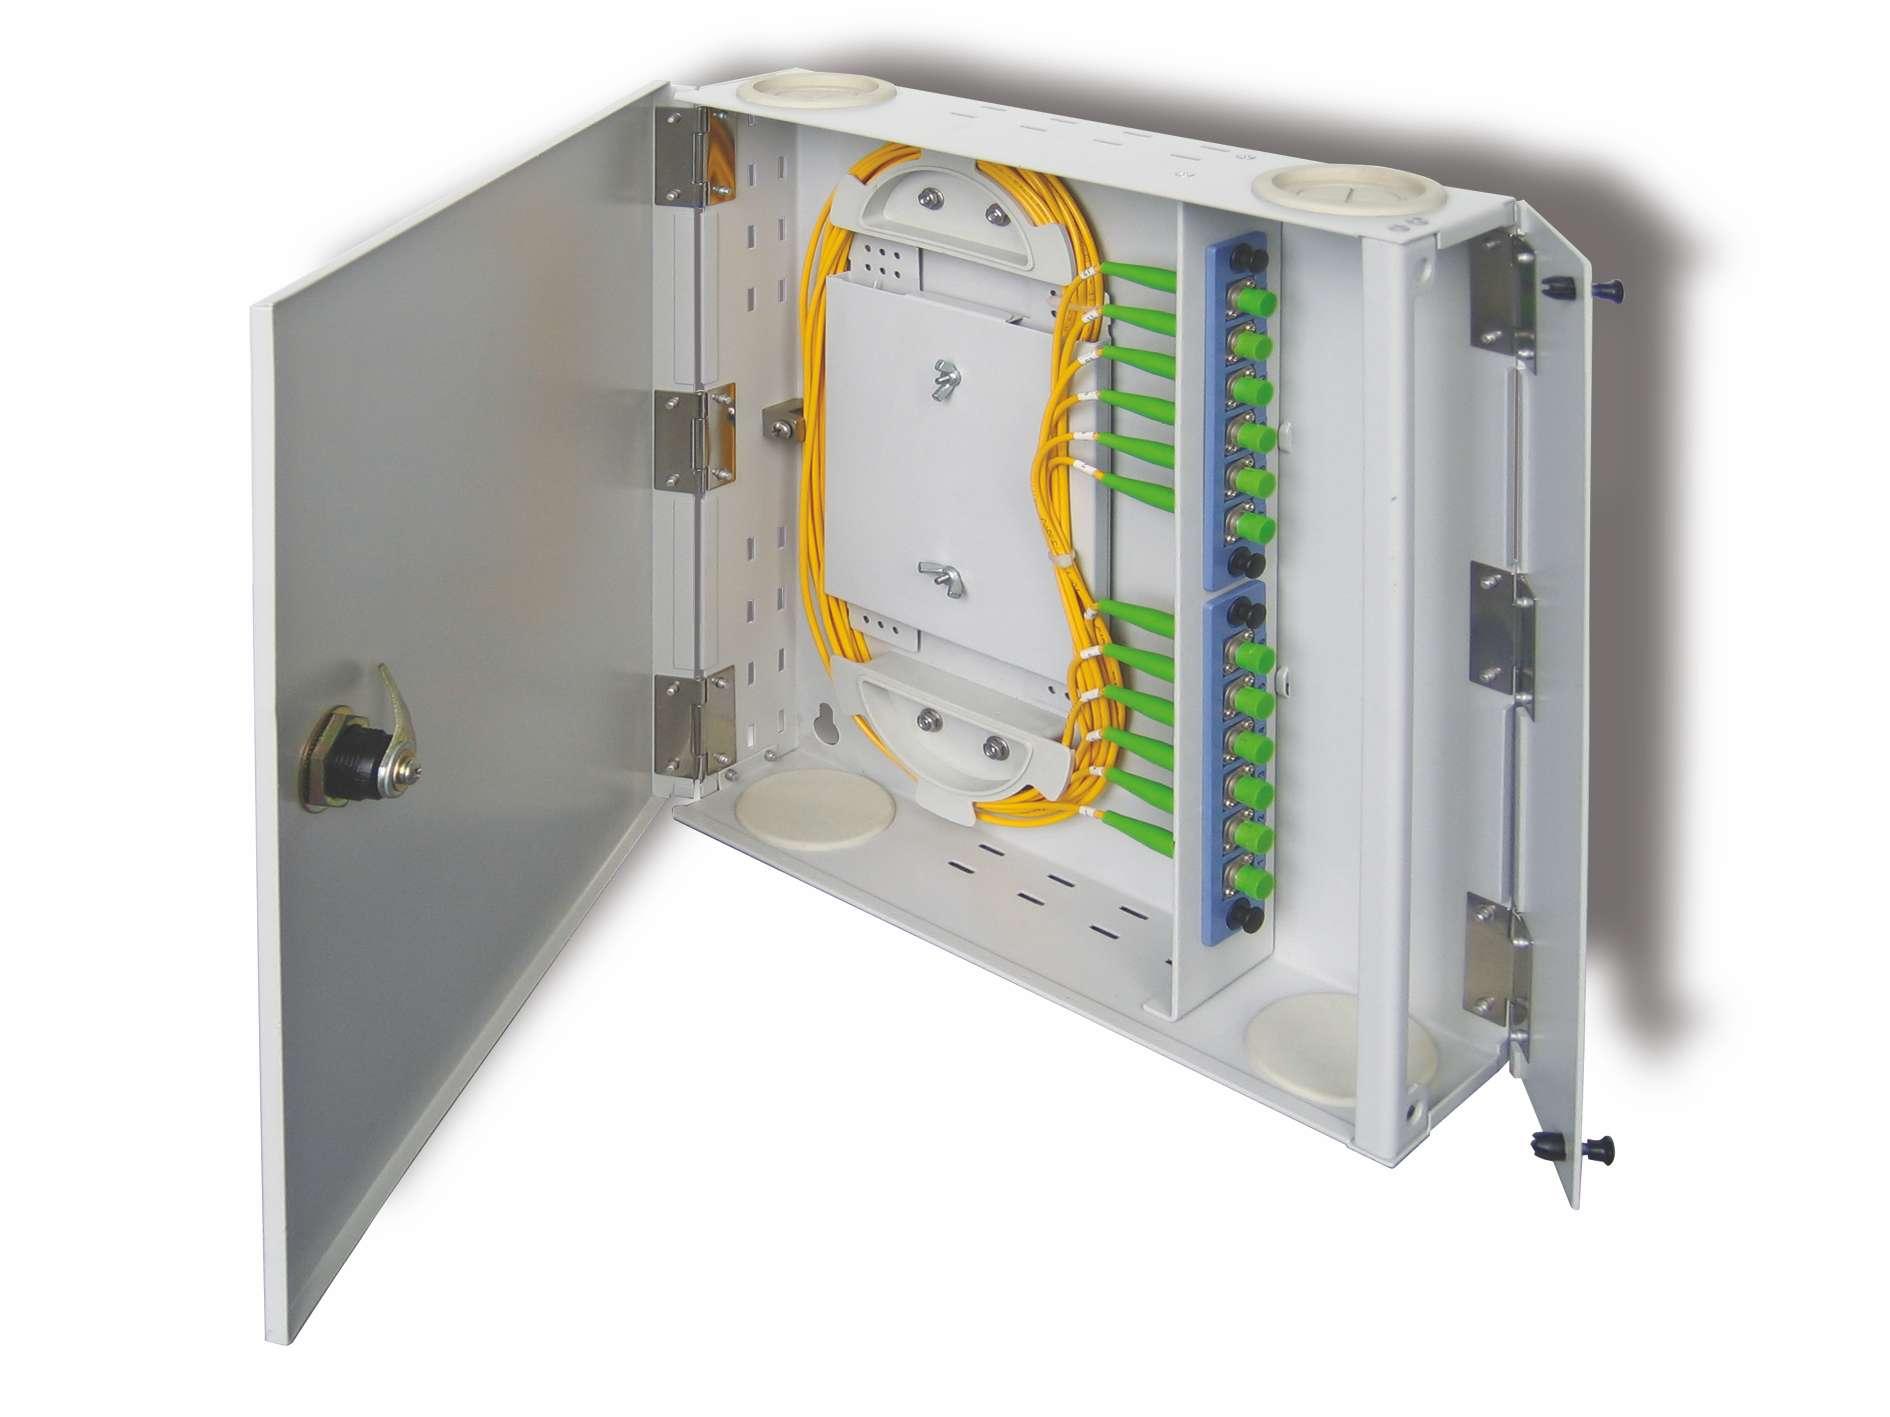 Waterproof Outdoor Fiber Optic Distribution Box Angled Patch Panel